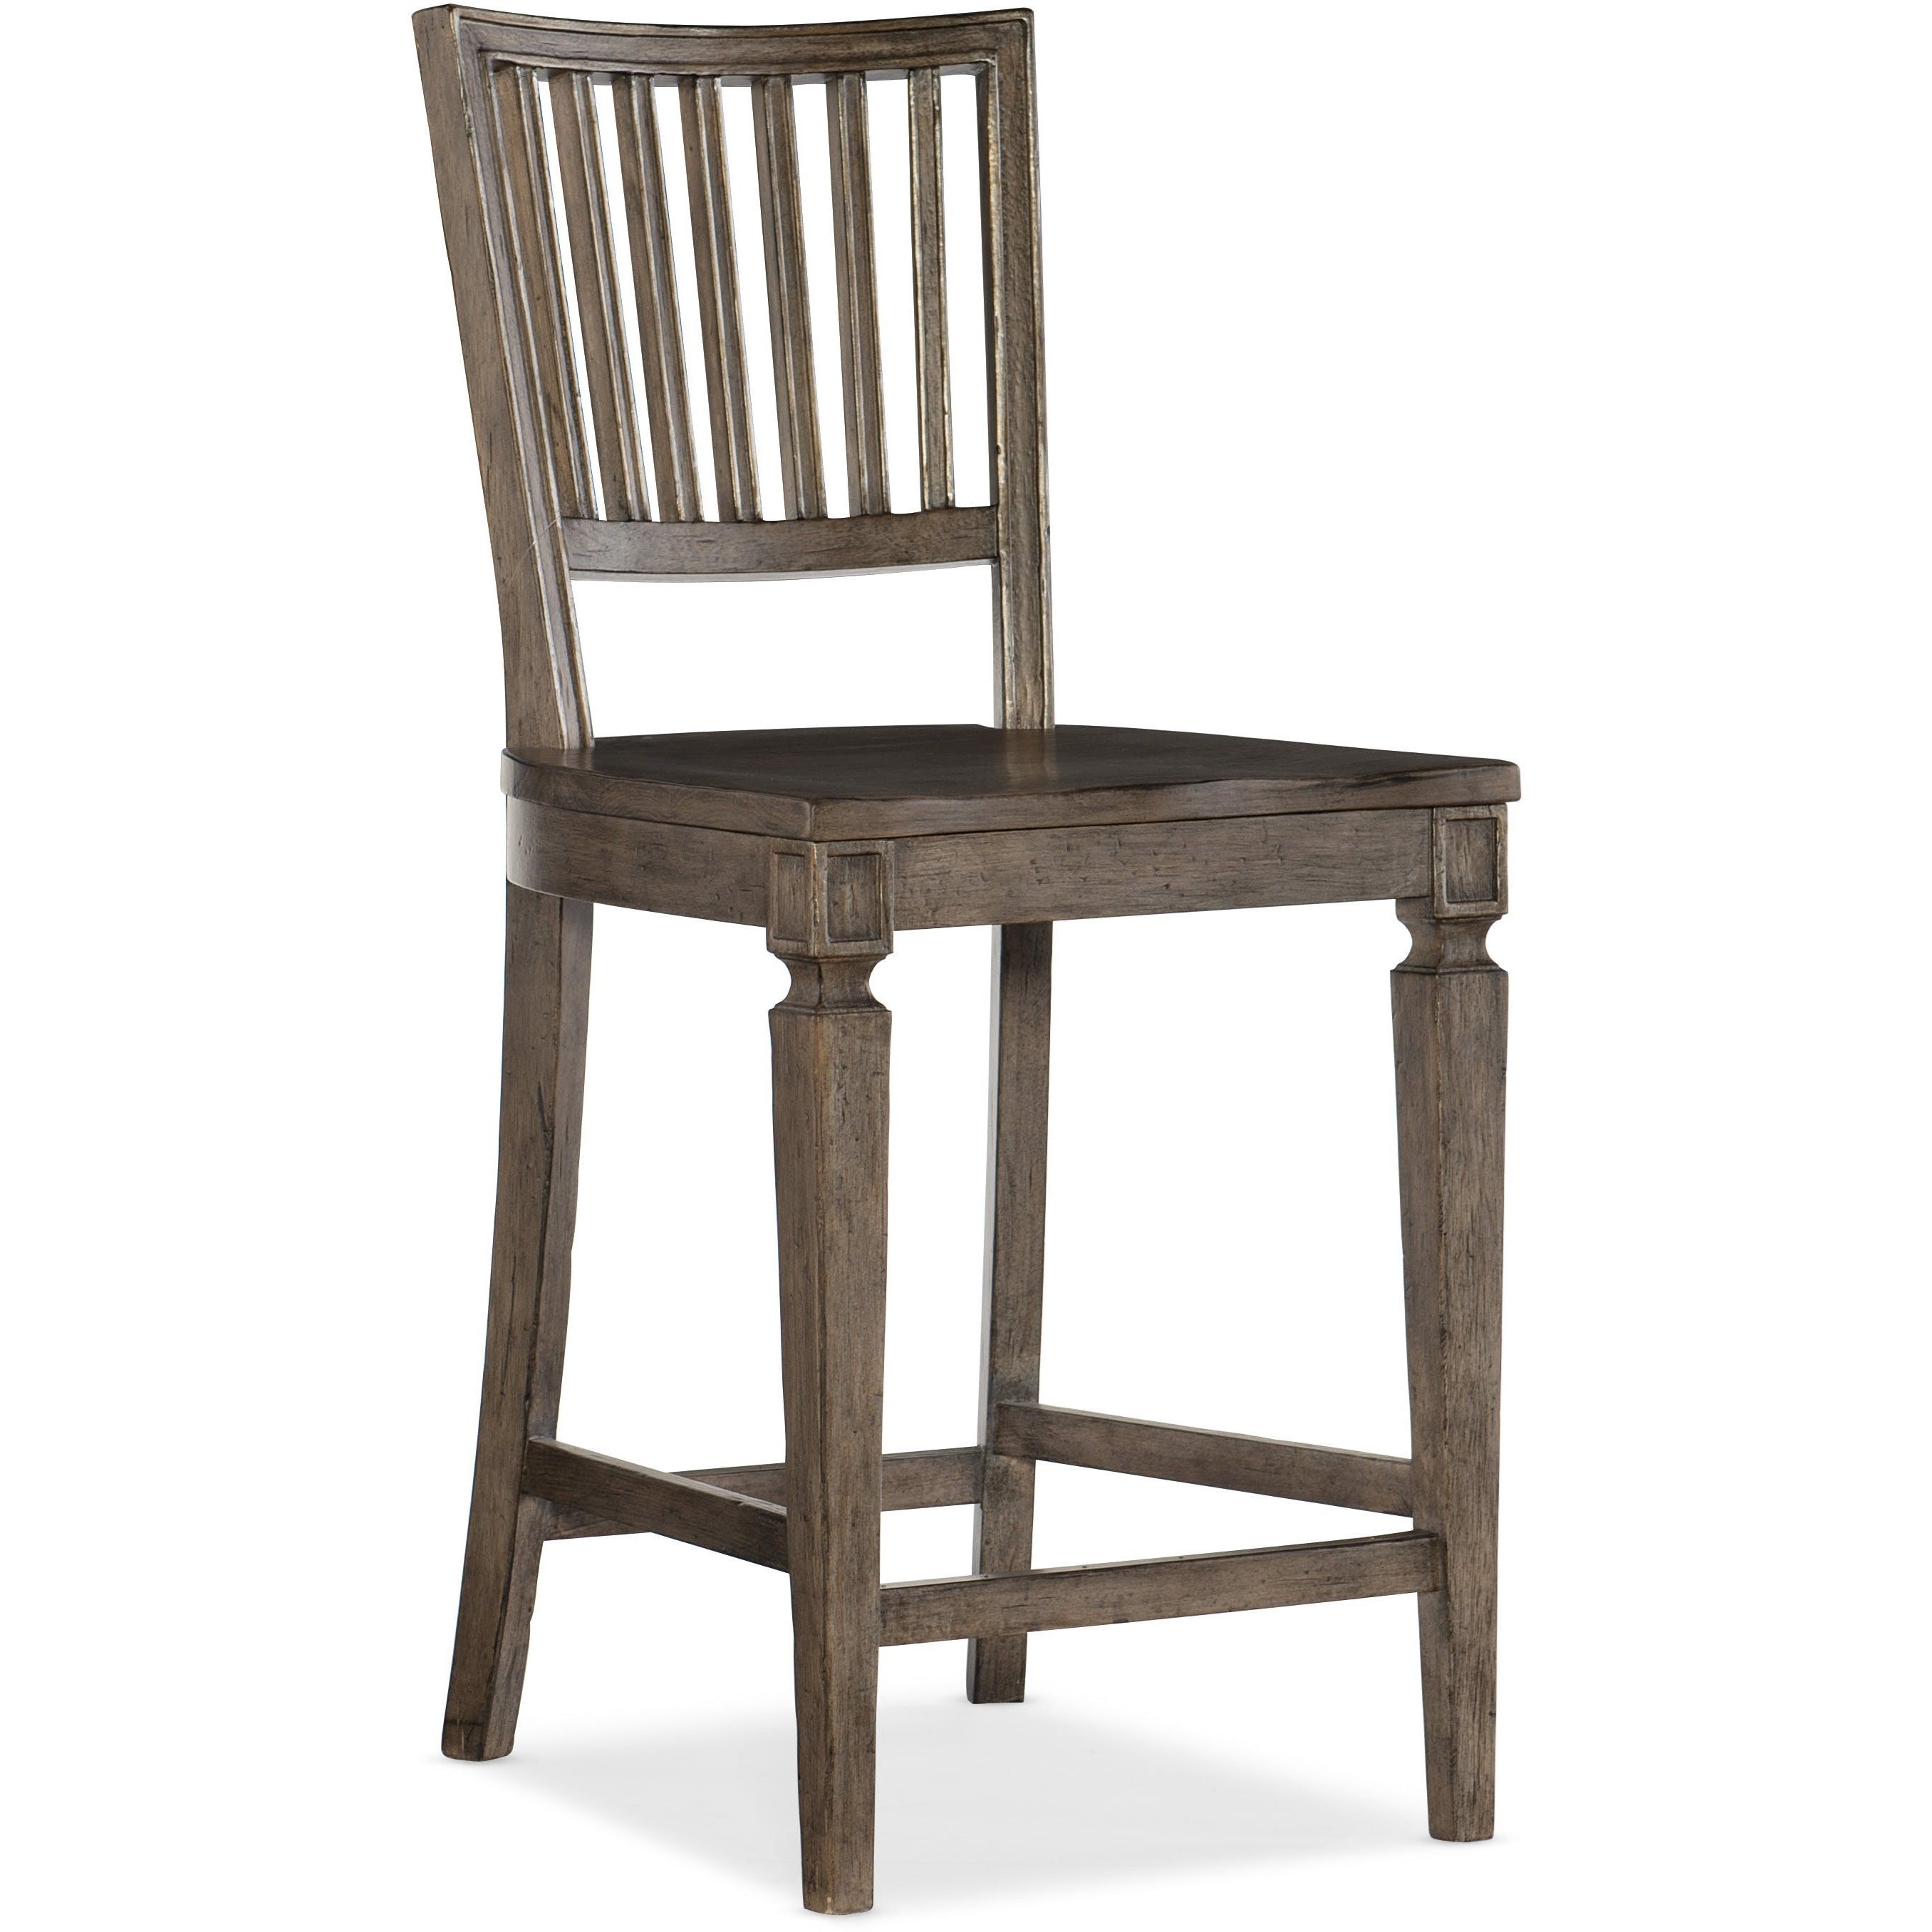 Woodlands Counter Stool by Hooker Furniture at Baer's Furniture